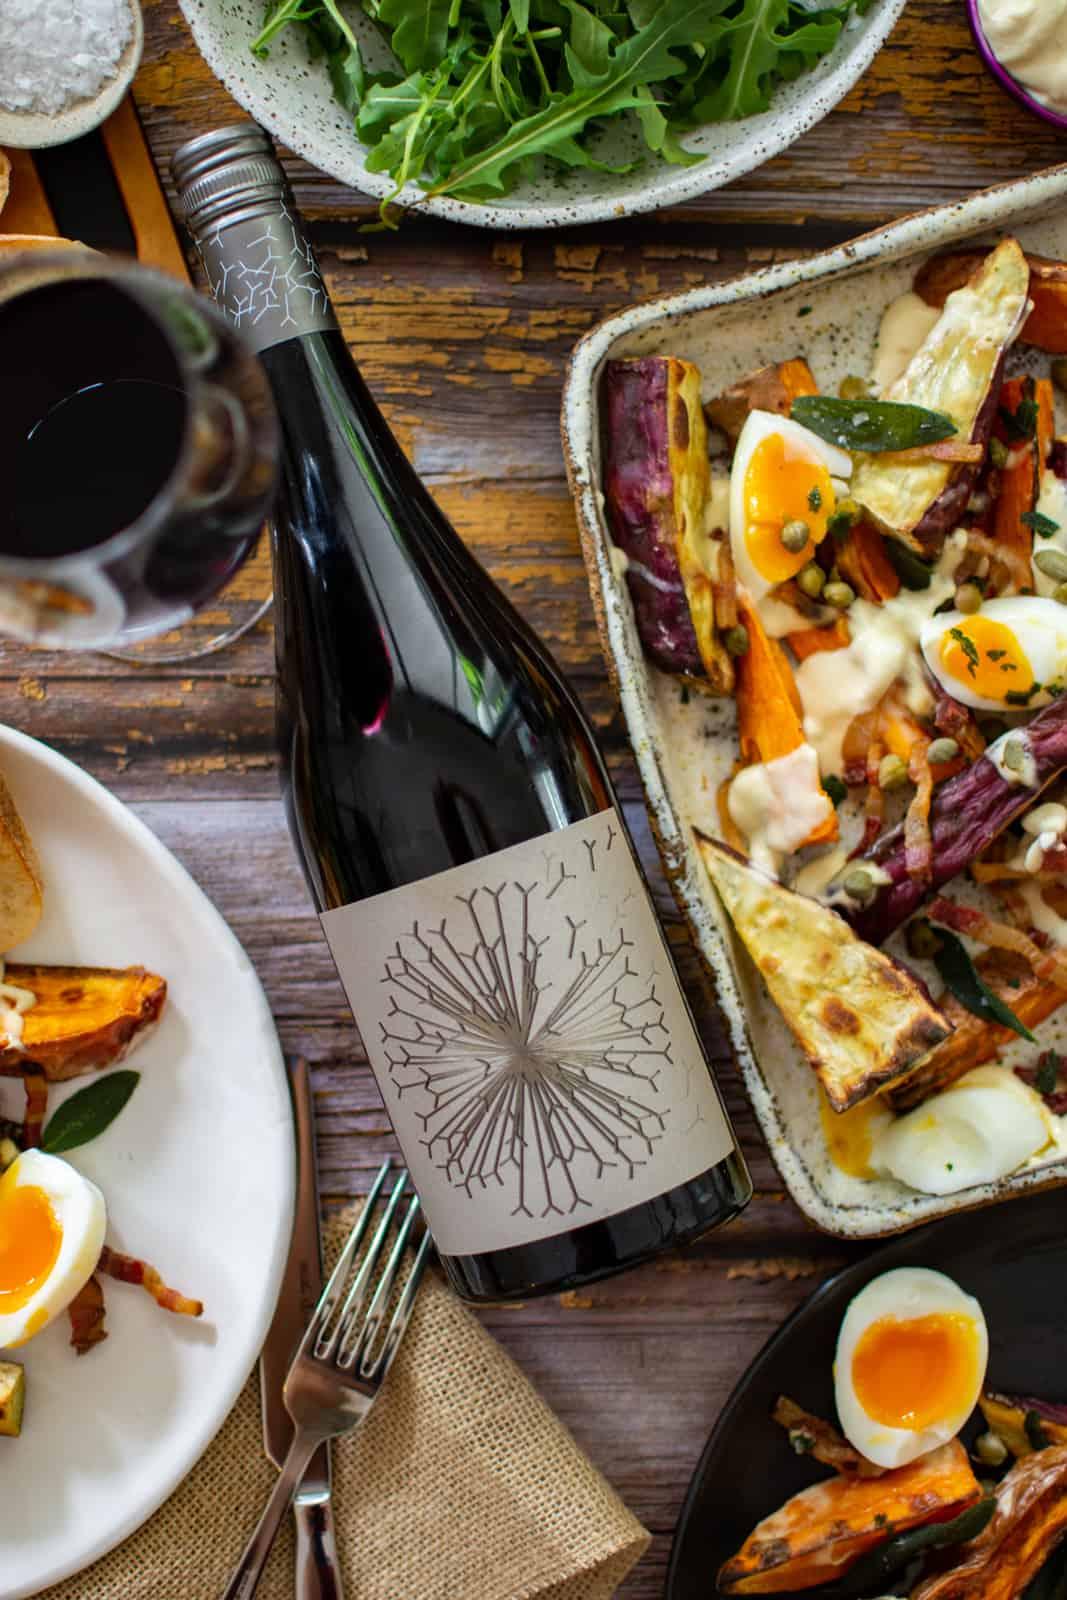 Dandelion vineyard wine and crispy roasted sweet potato salad on a plate